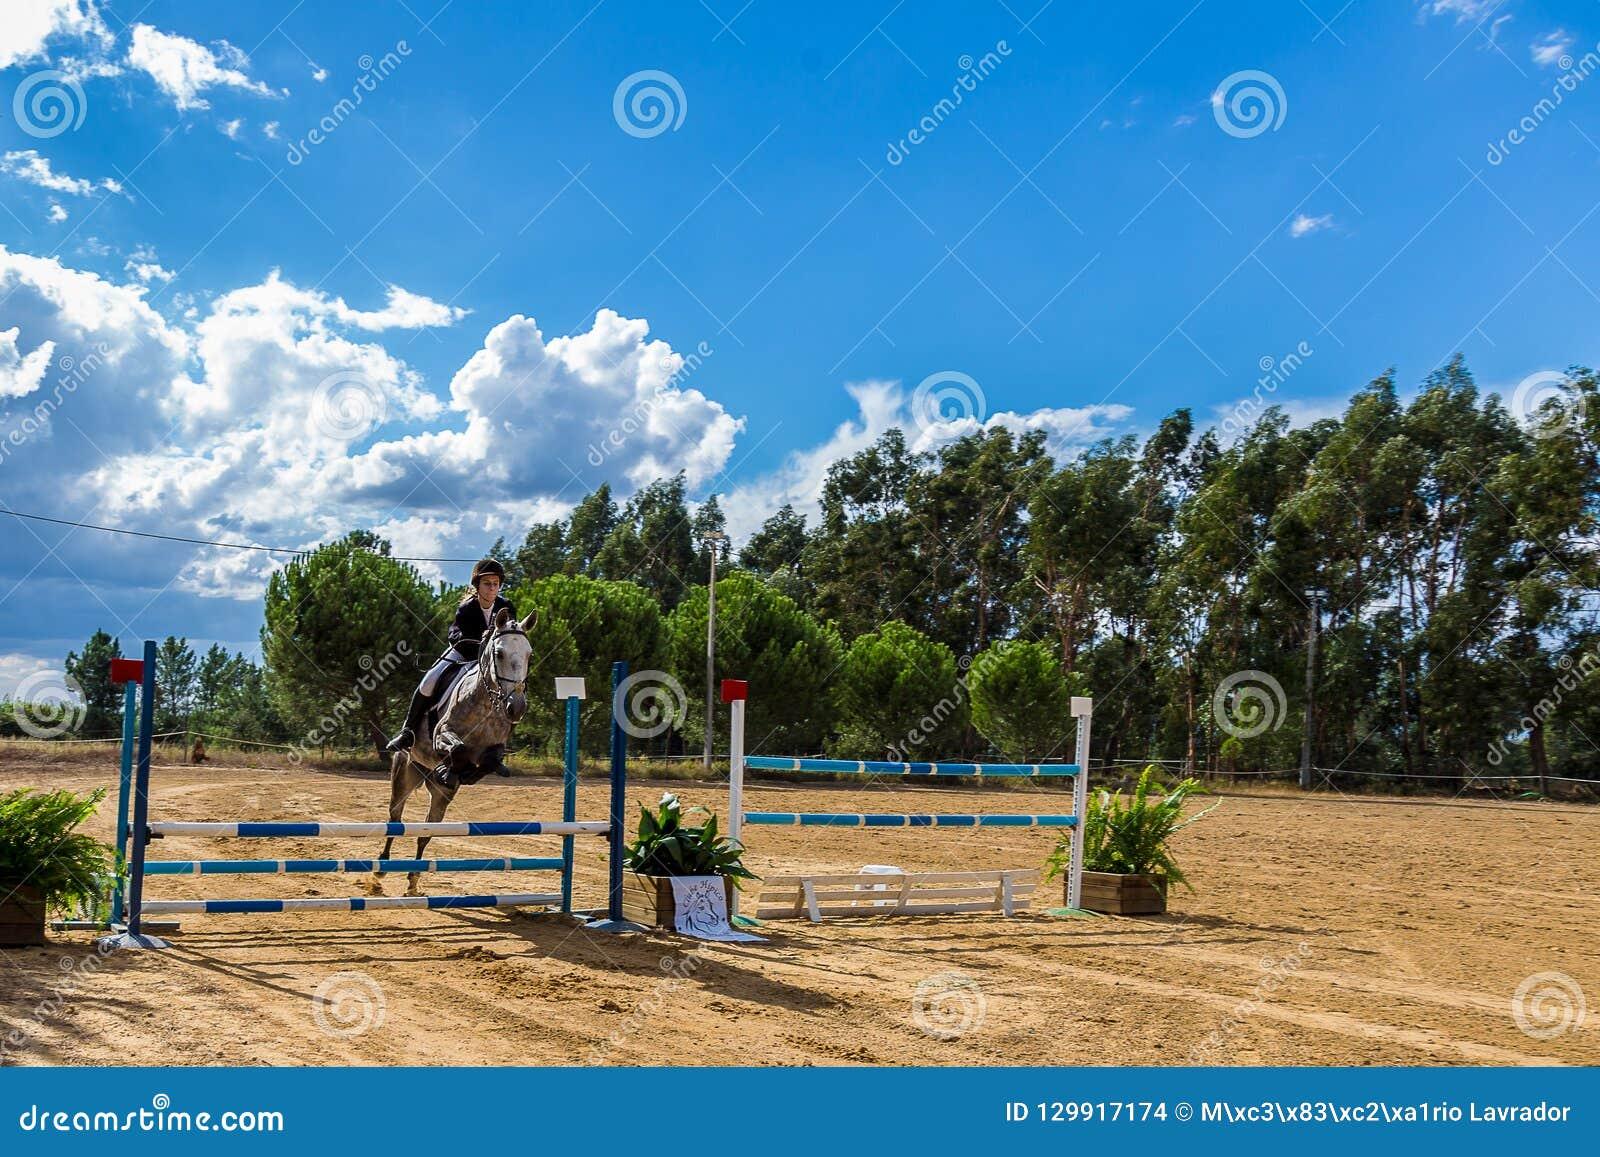 Equestrianism σε μια πορτογαλική επιφύλαξη αλόγων φύσης